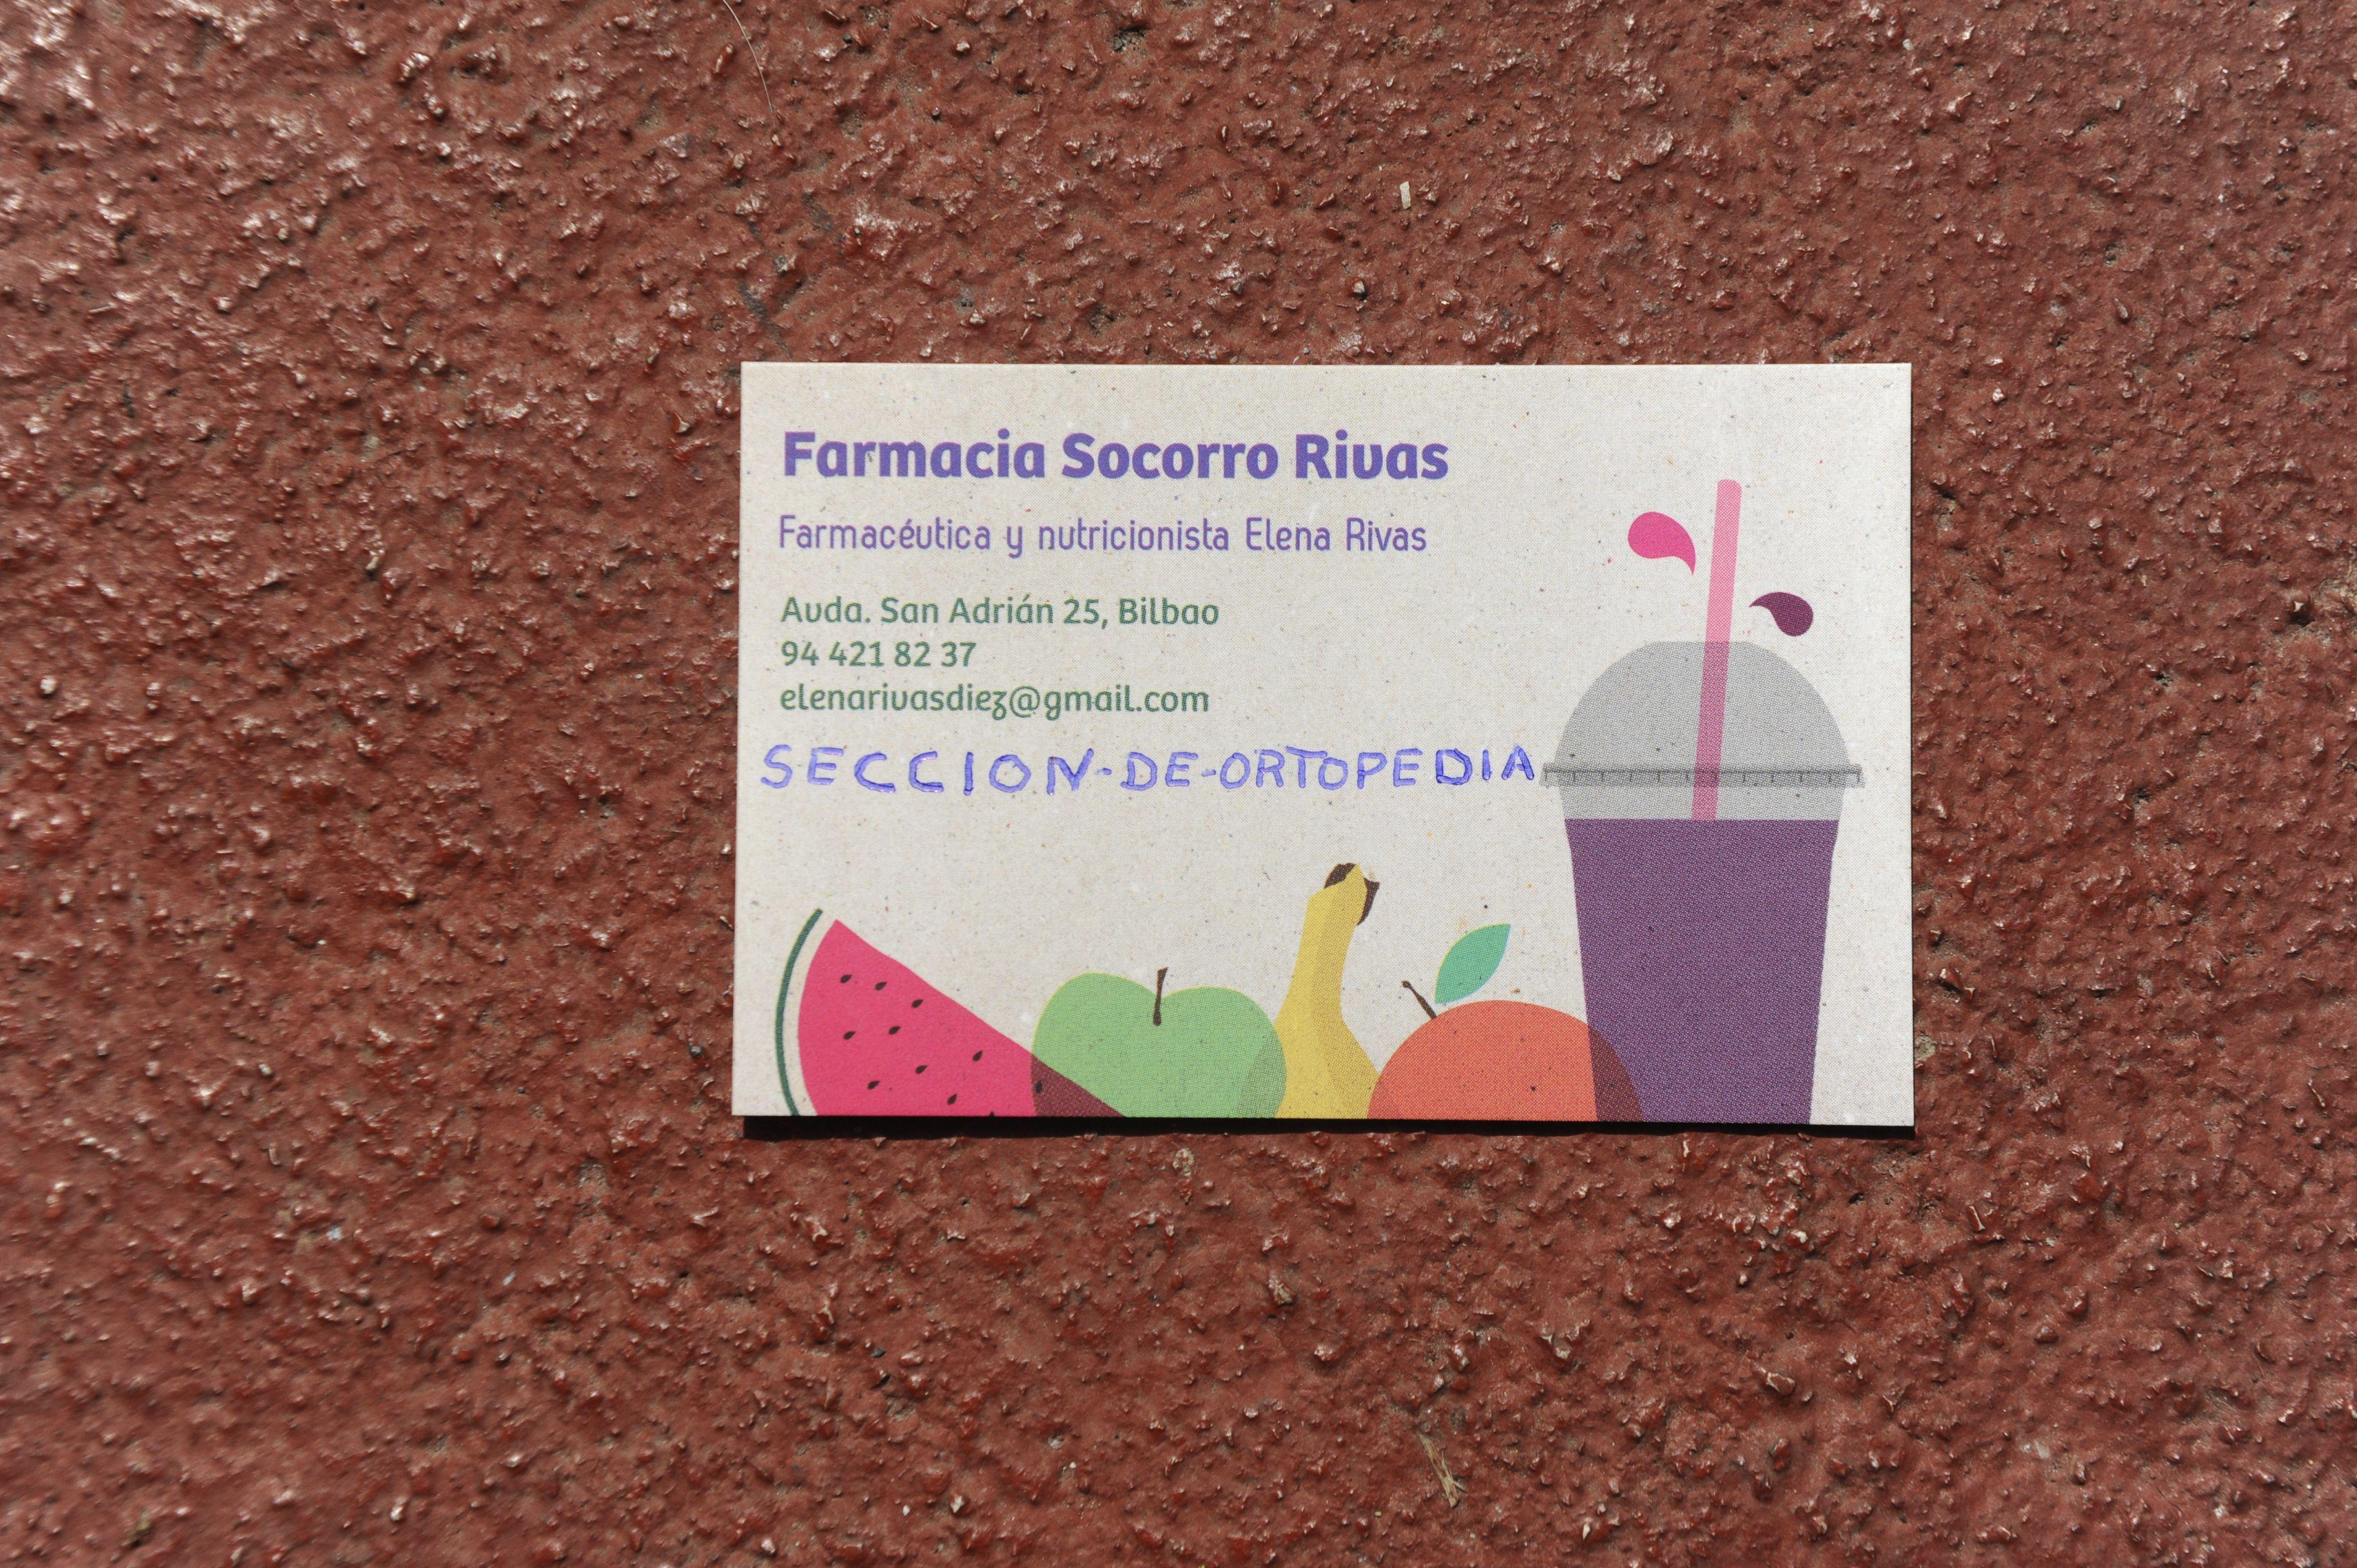 Foto 7 de Farmacia en Bilbao | Farmacia Socorro Rivas Castreje